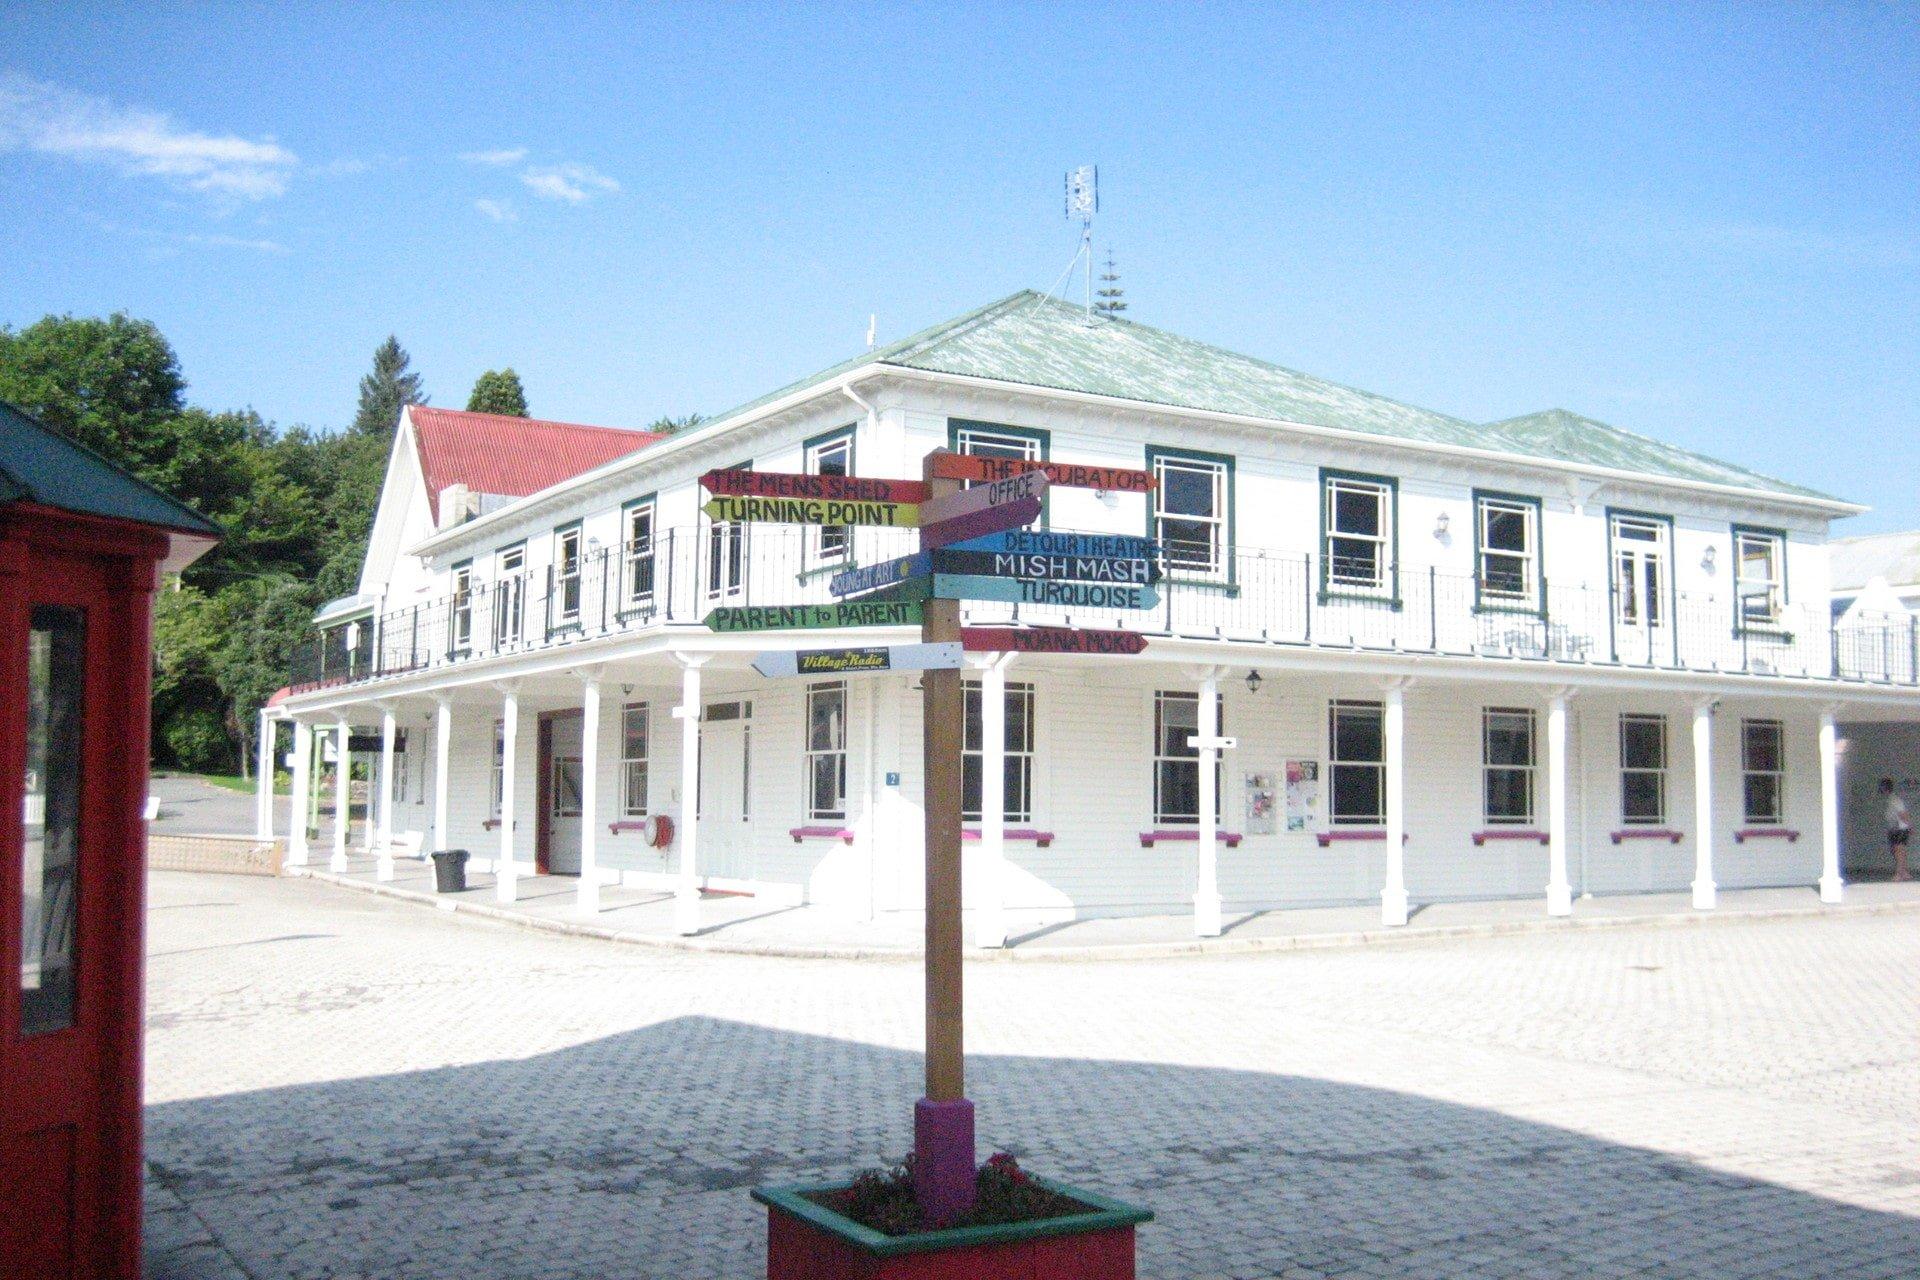 streets-historic-village-tauranga